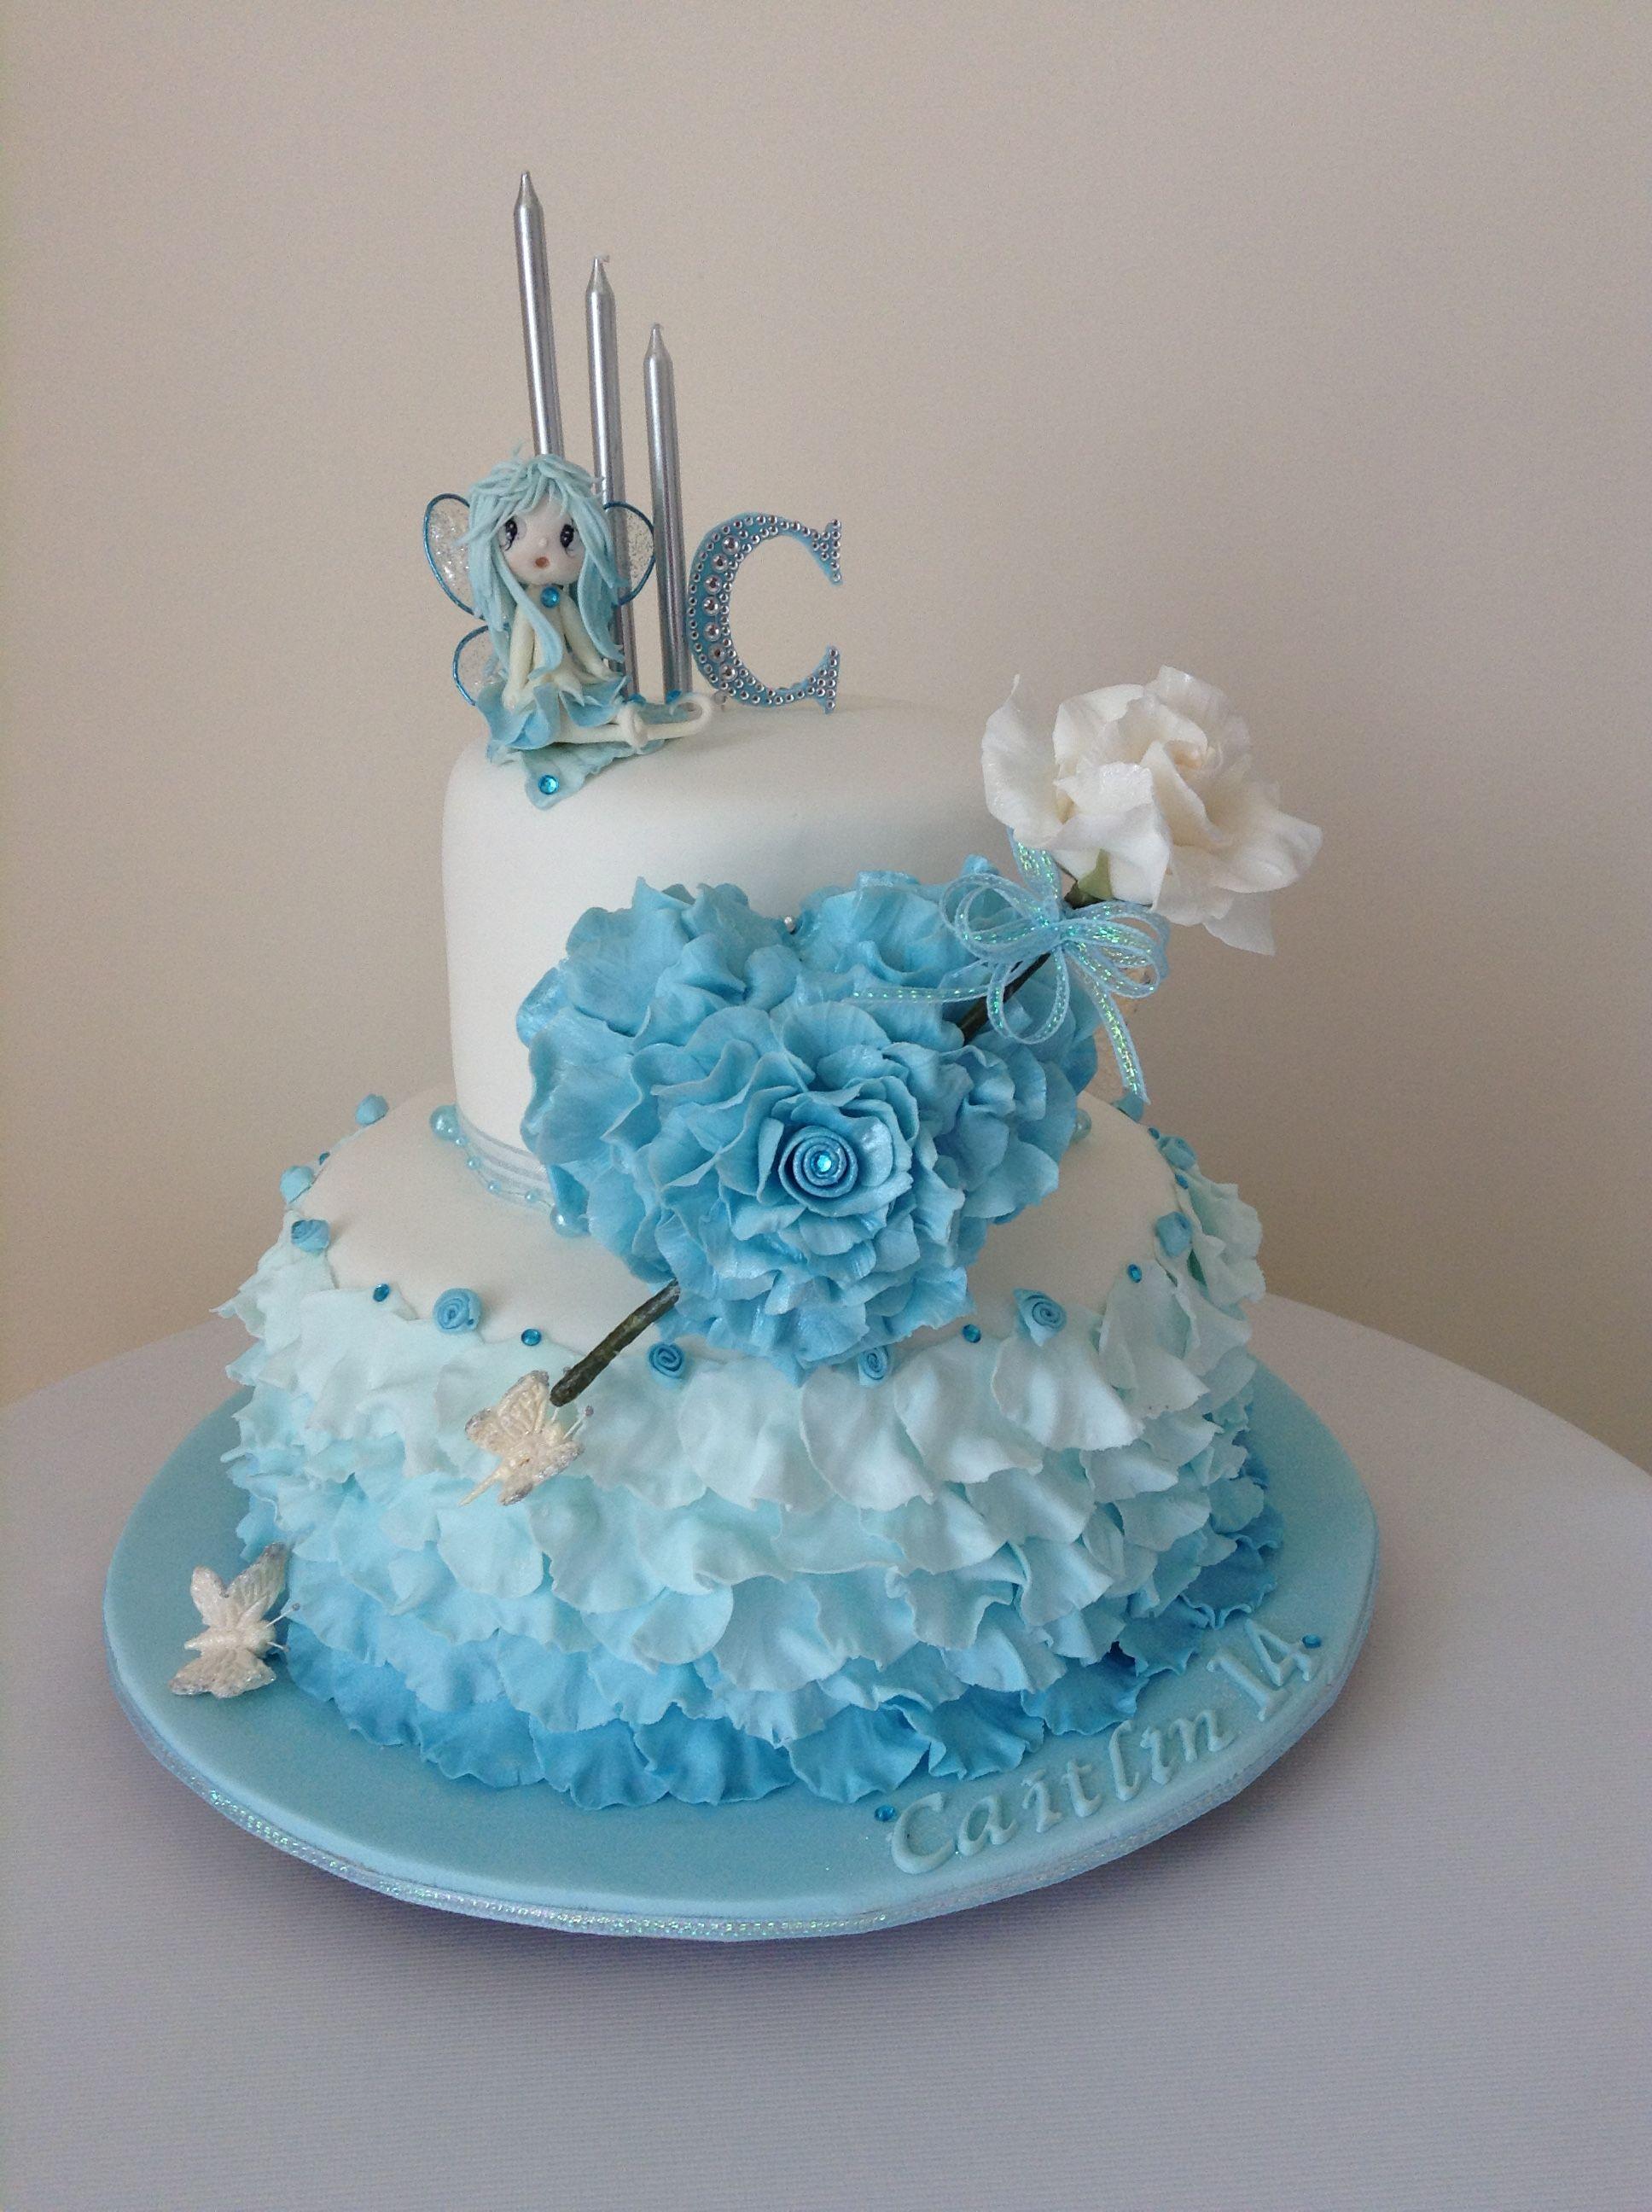 My grand daughters 14th birthday cake